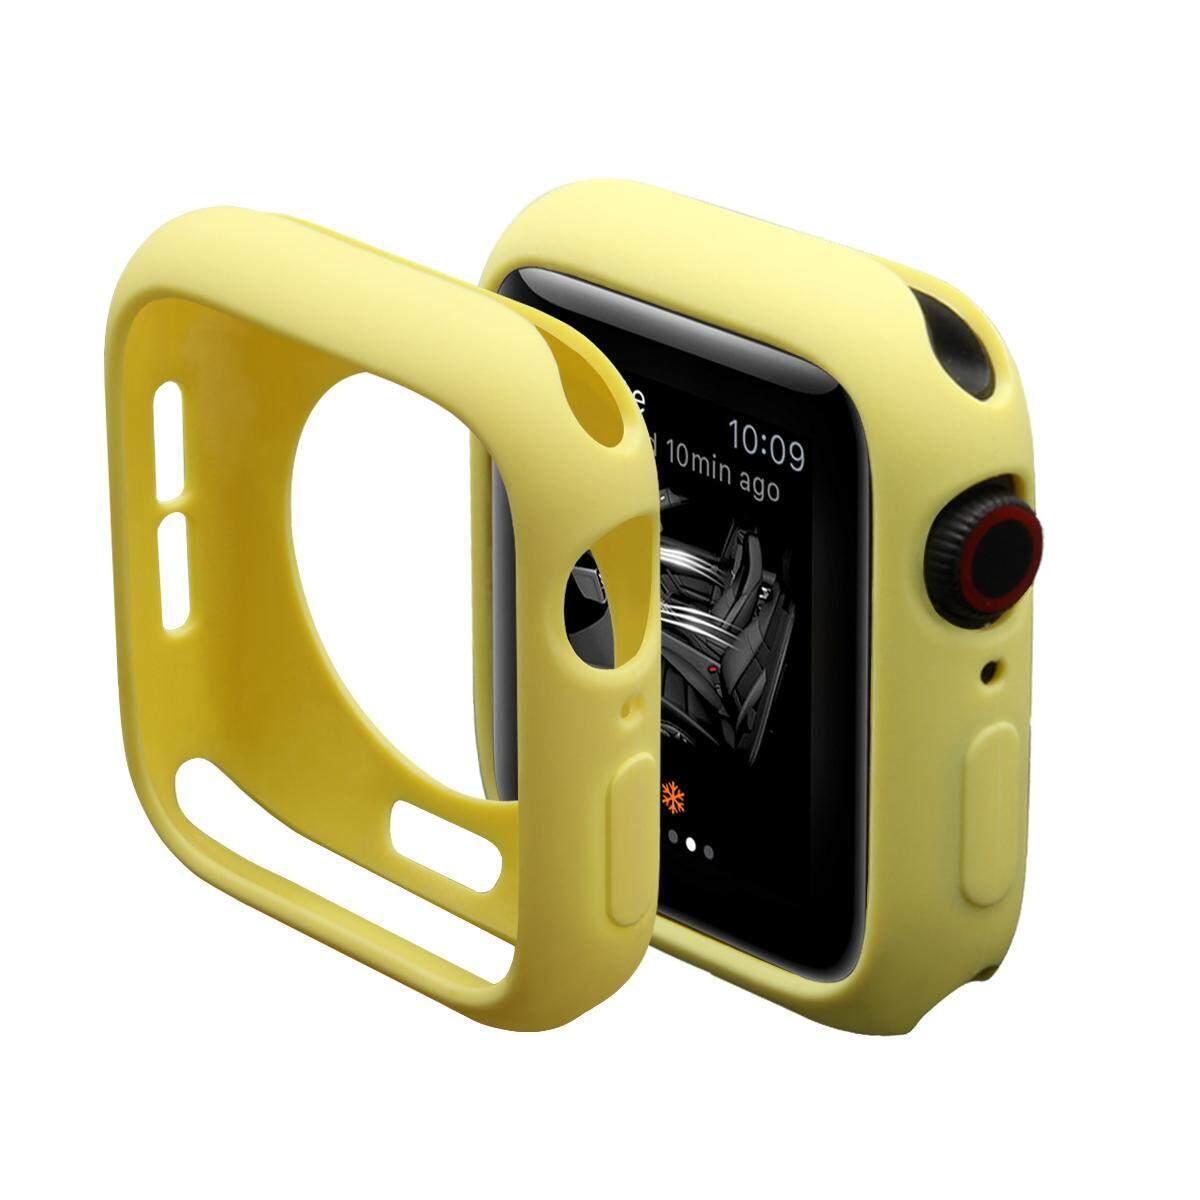 Lembut Tahan Guncangan Silikon Penuh Bumper Pelindung Frame Case Penutup untuk Apple Watch Seri 4 44